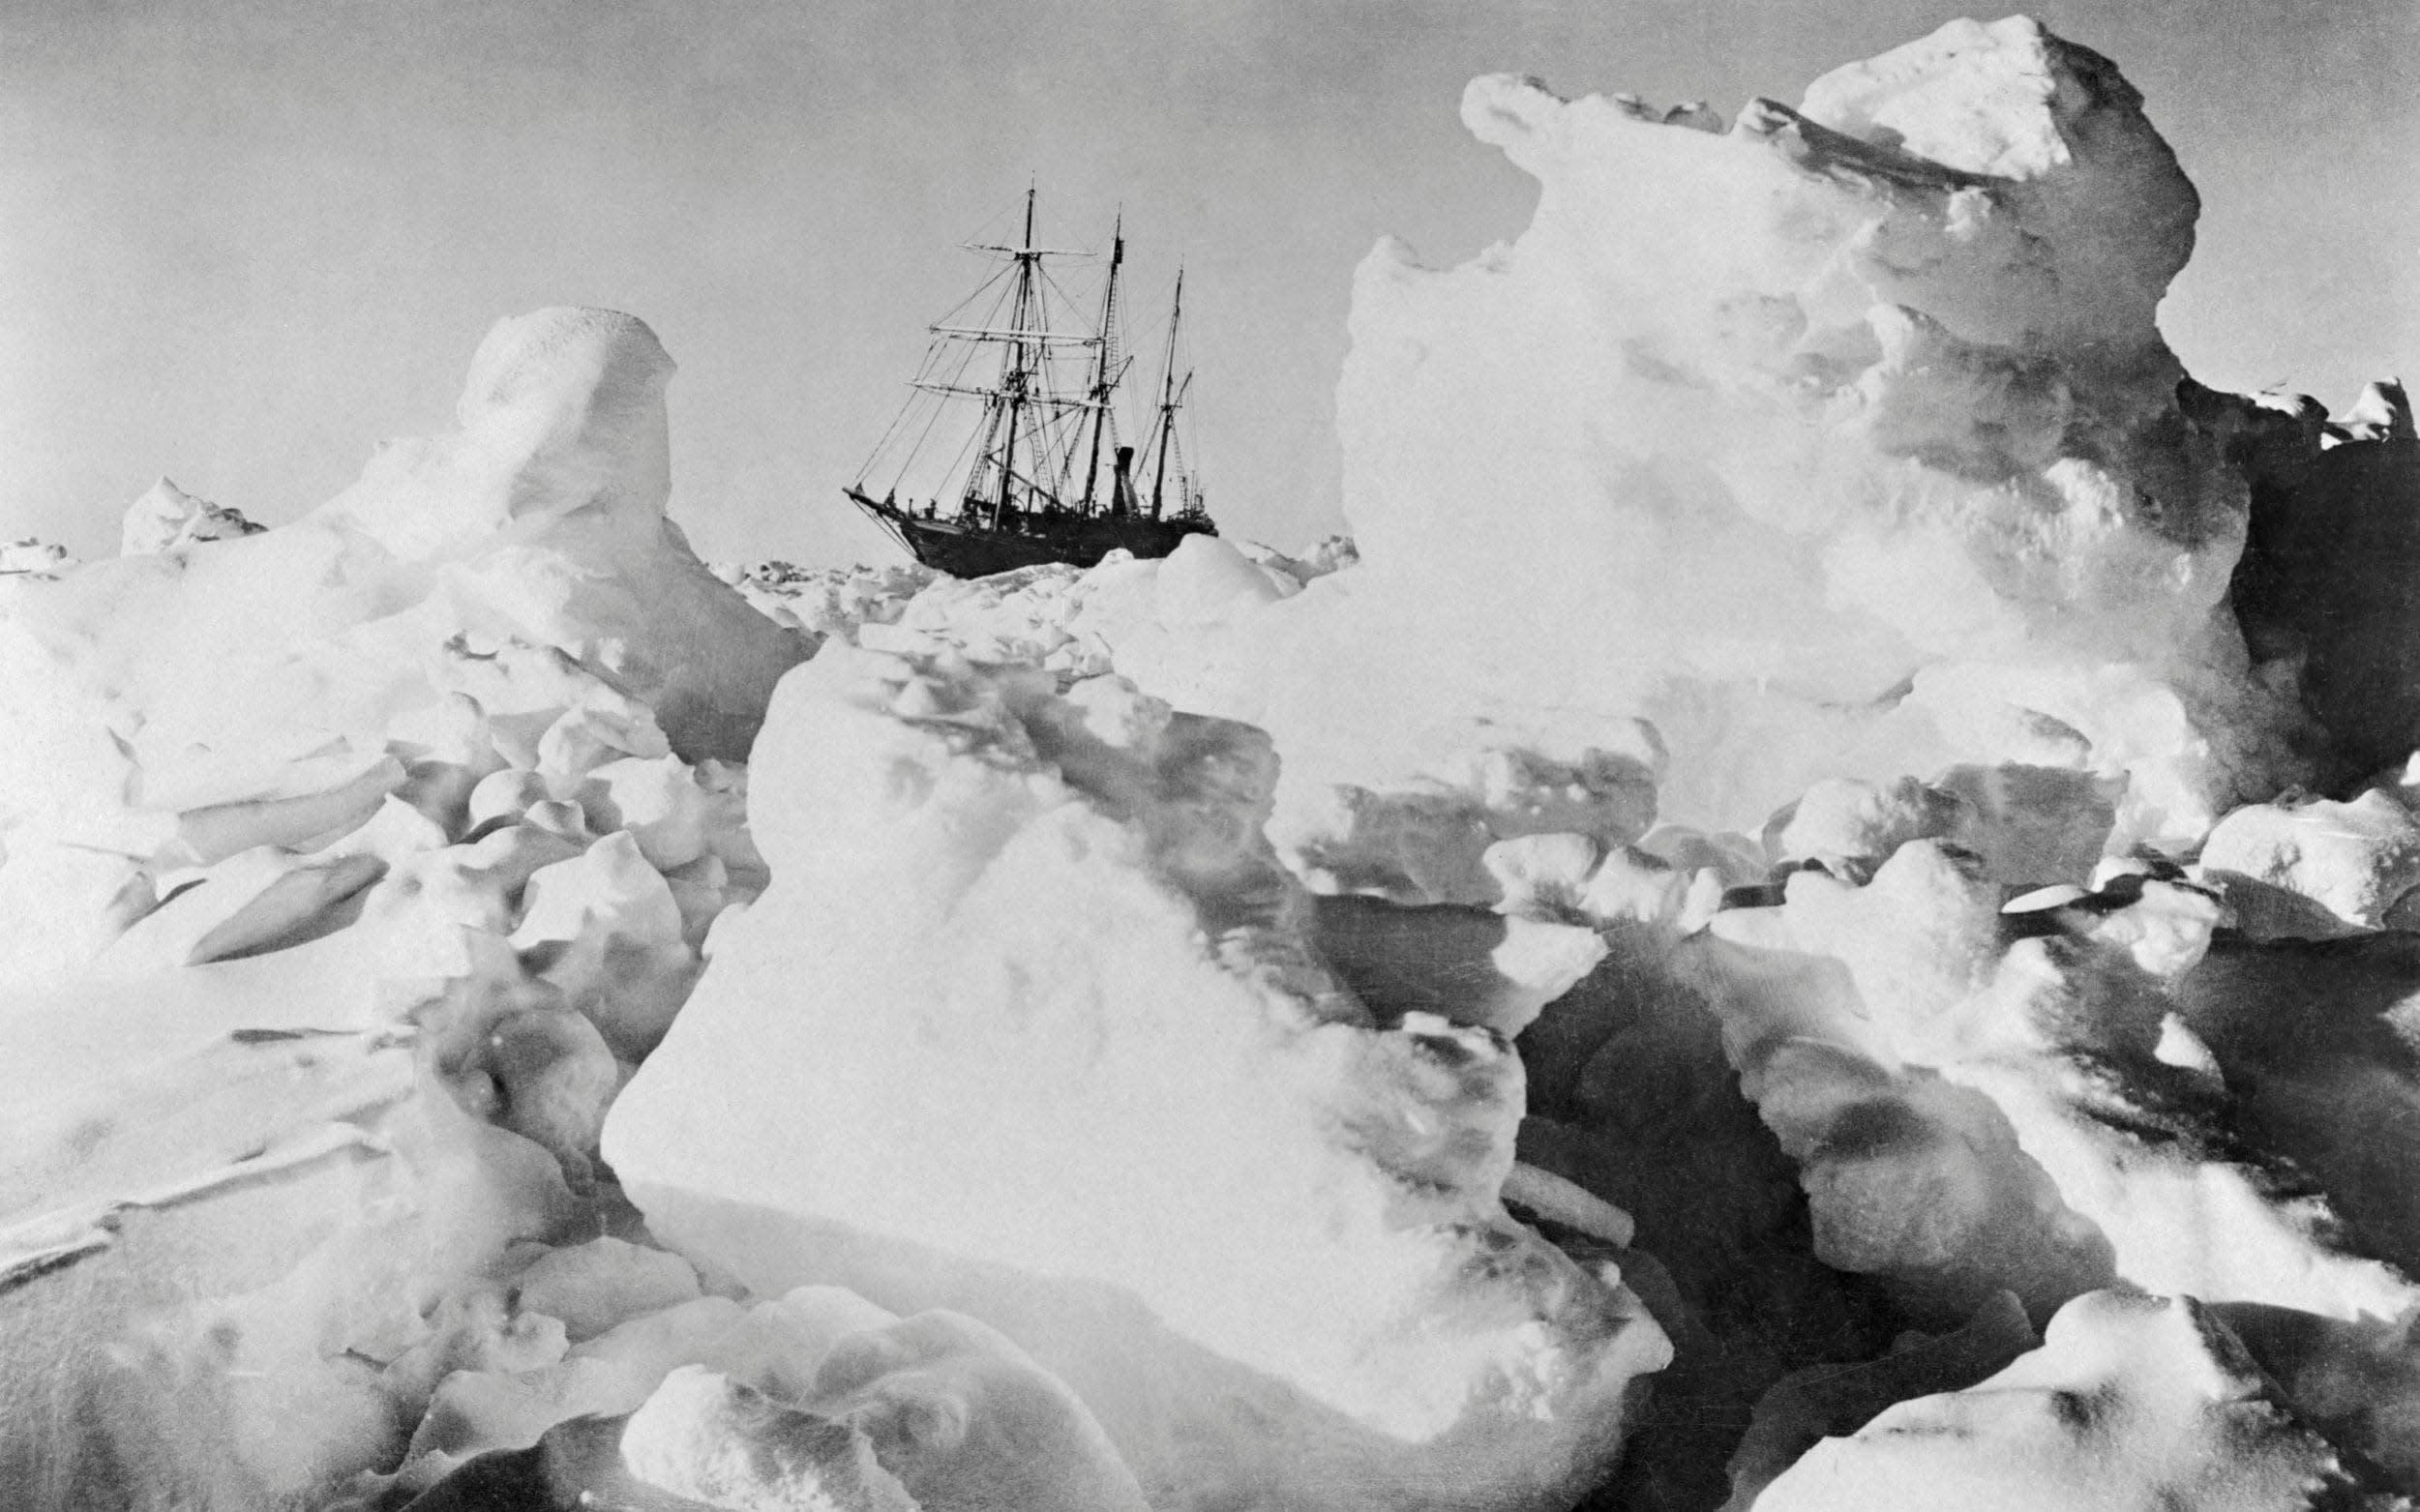 shackletons lost ship endurance - HD2501×1563